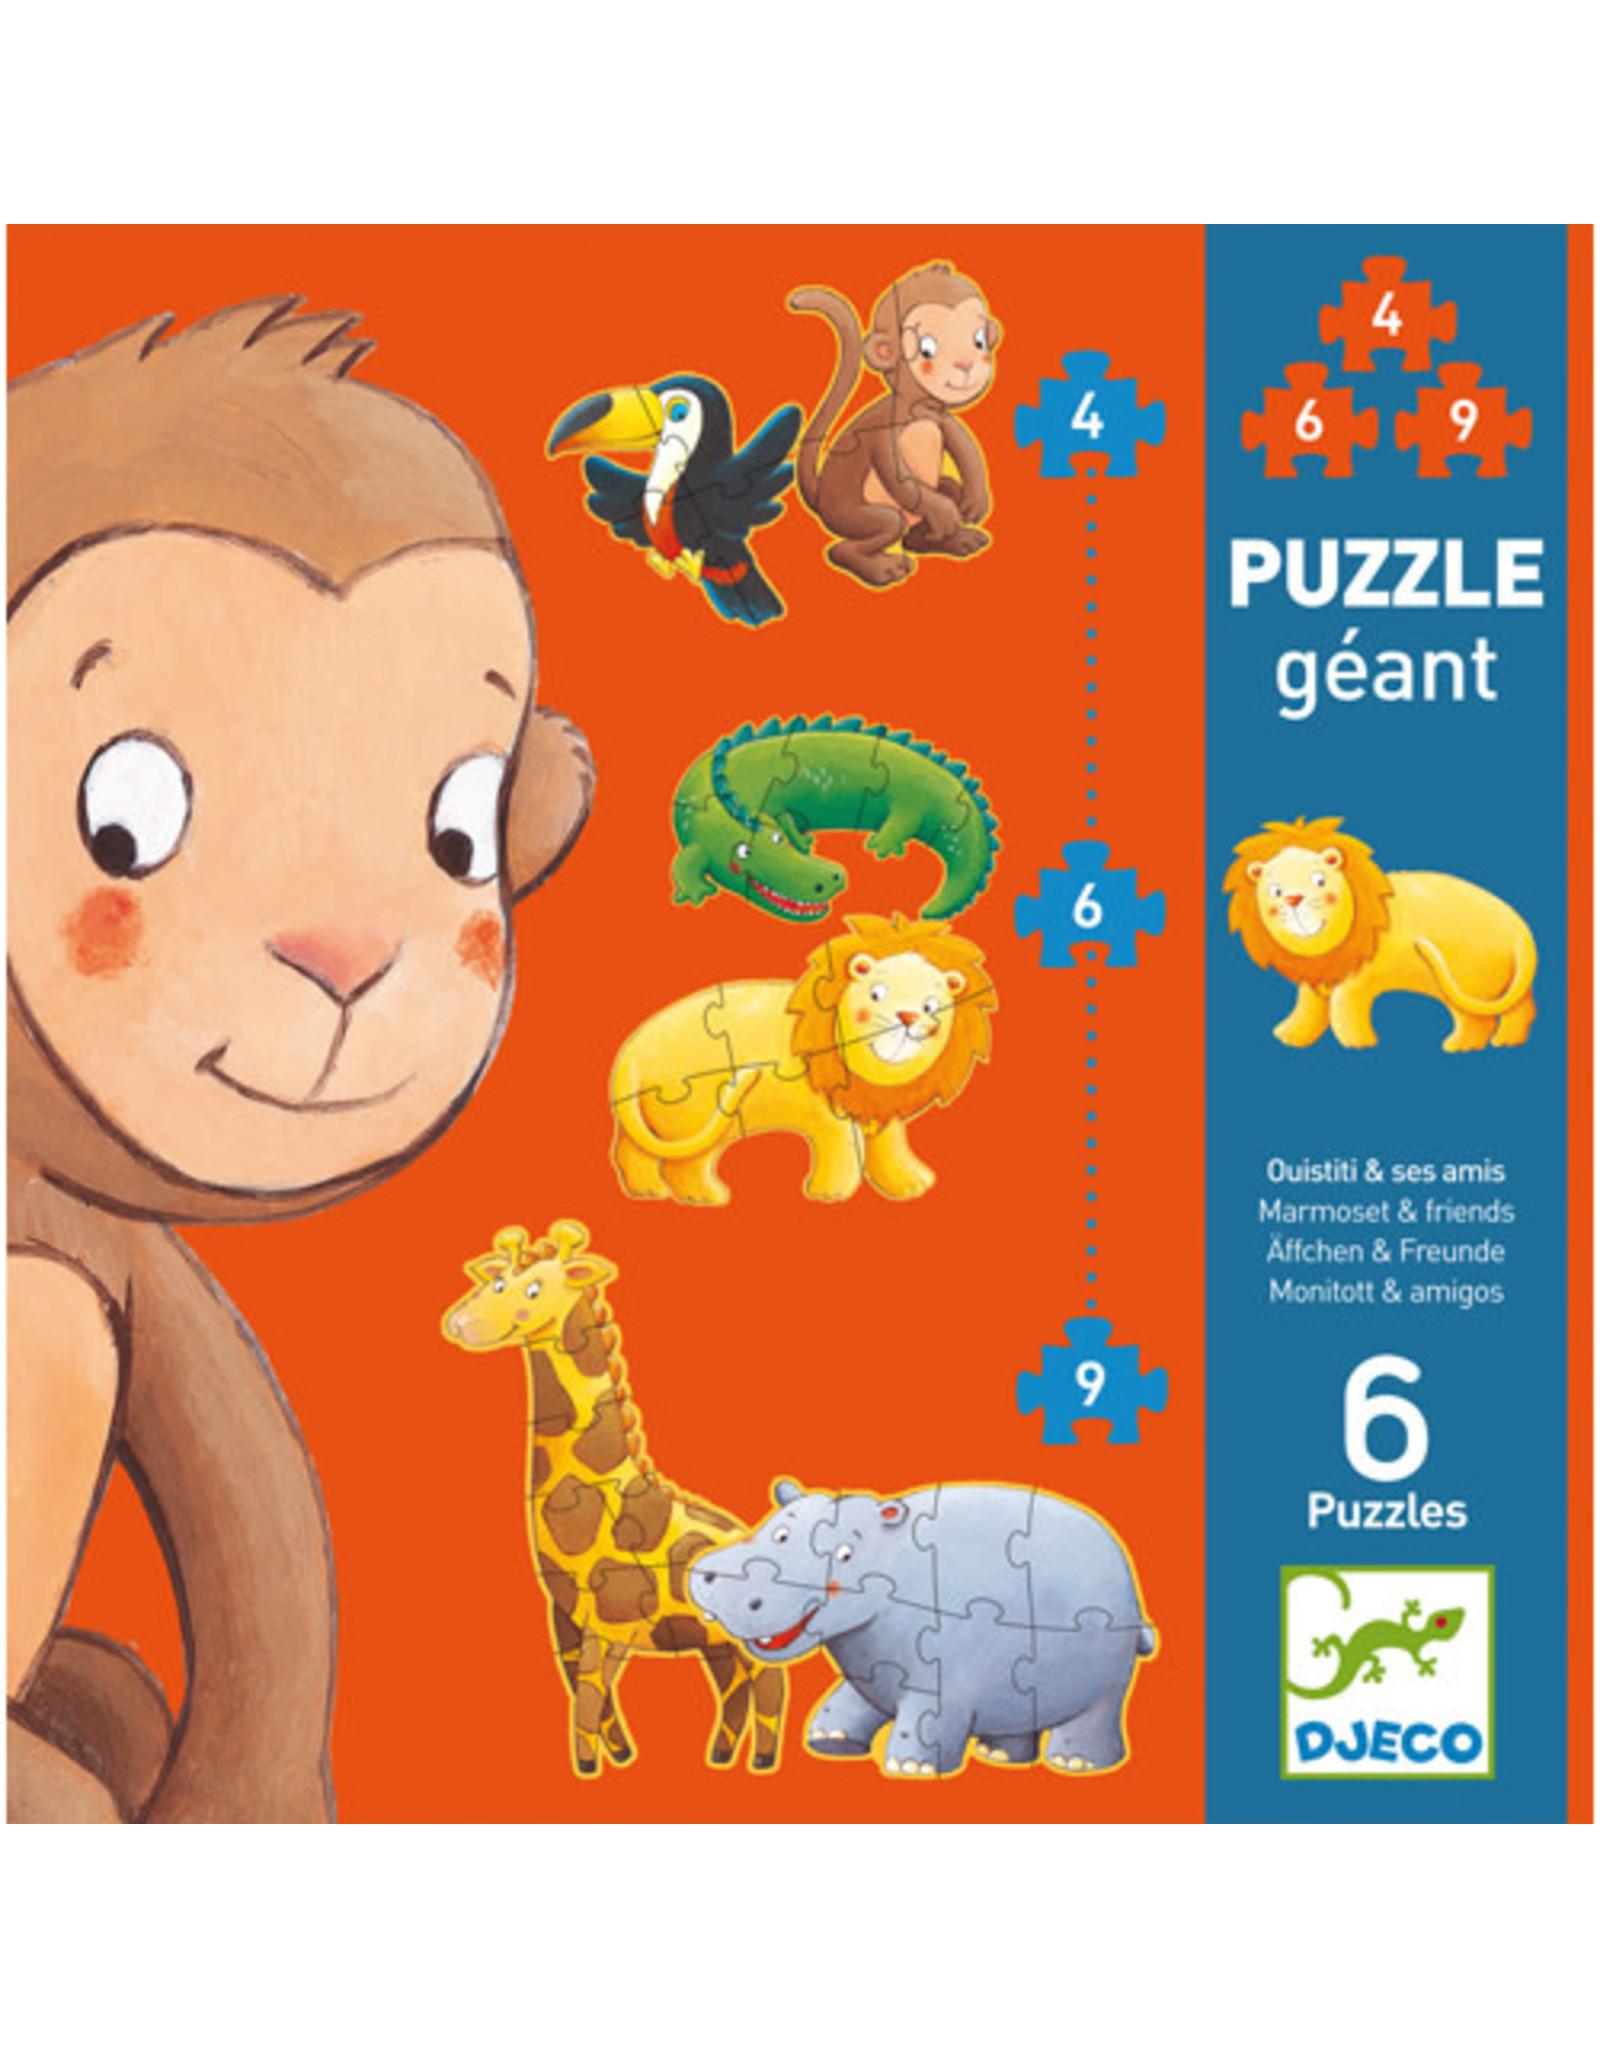 Djeco Giant Puzzle: Marmoset & Friends 4, 6 & 9pc